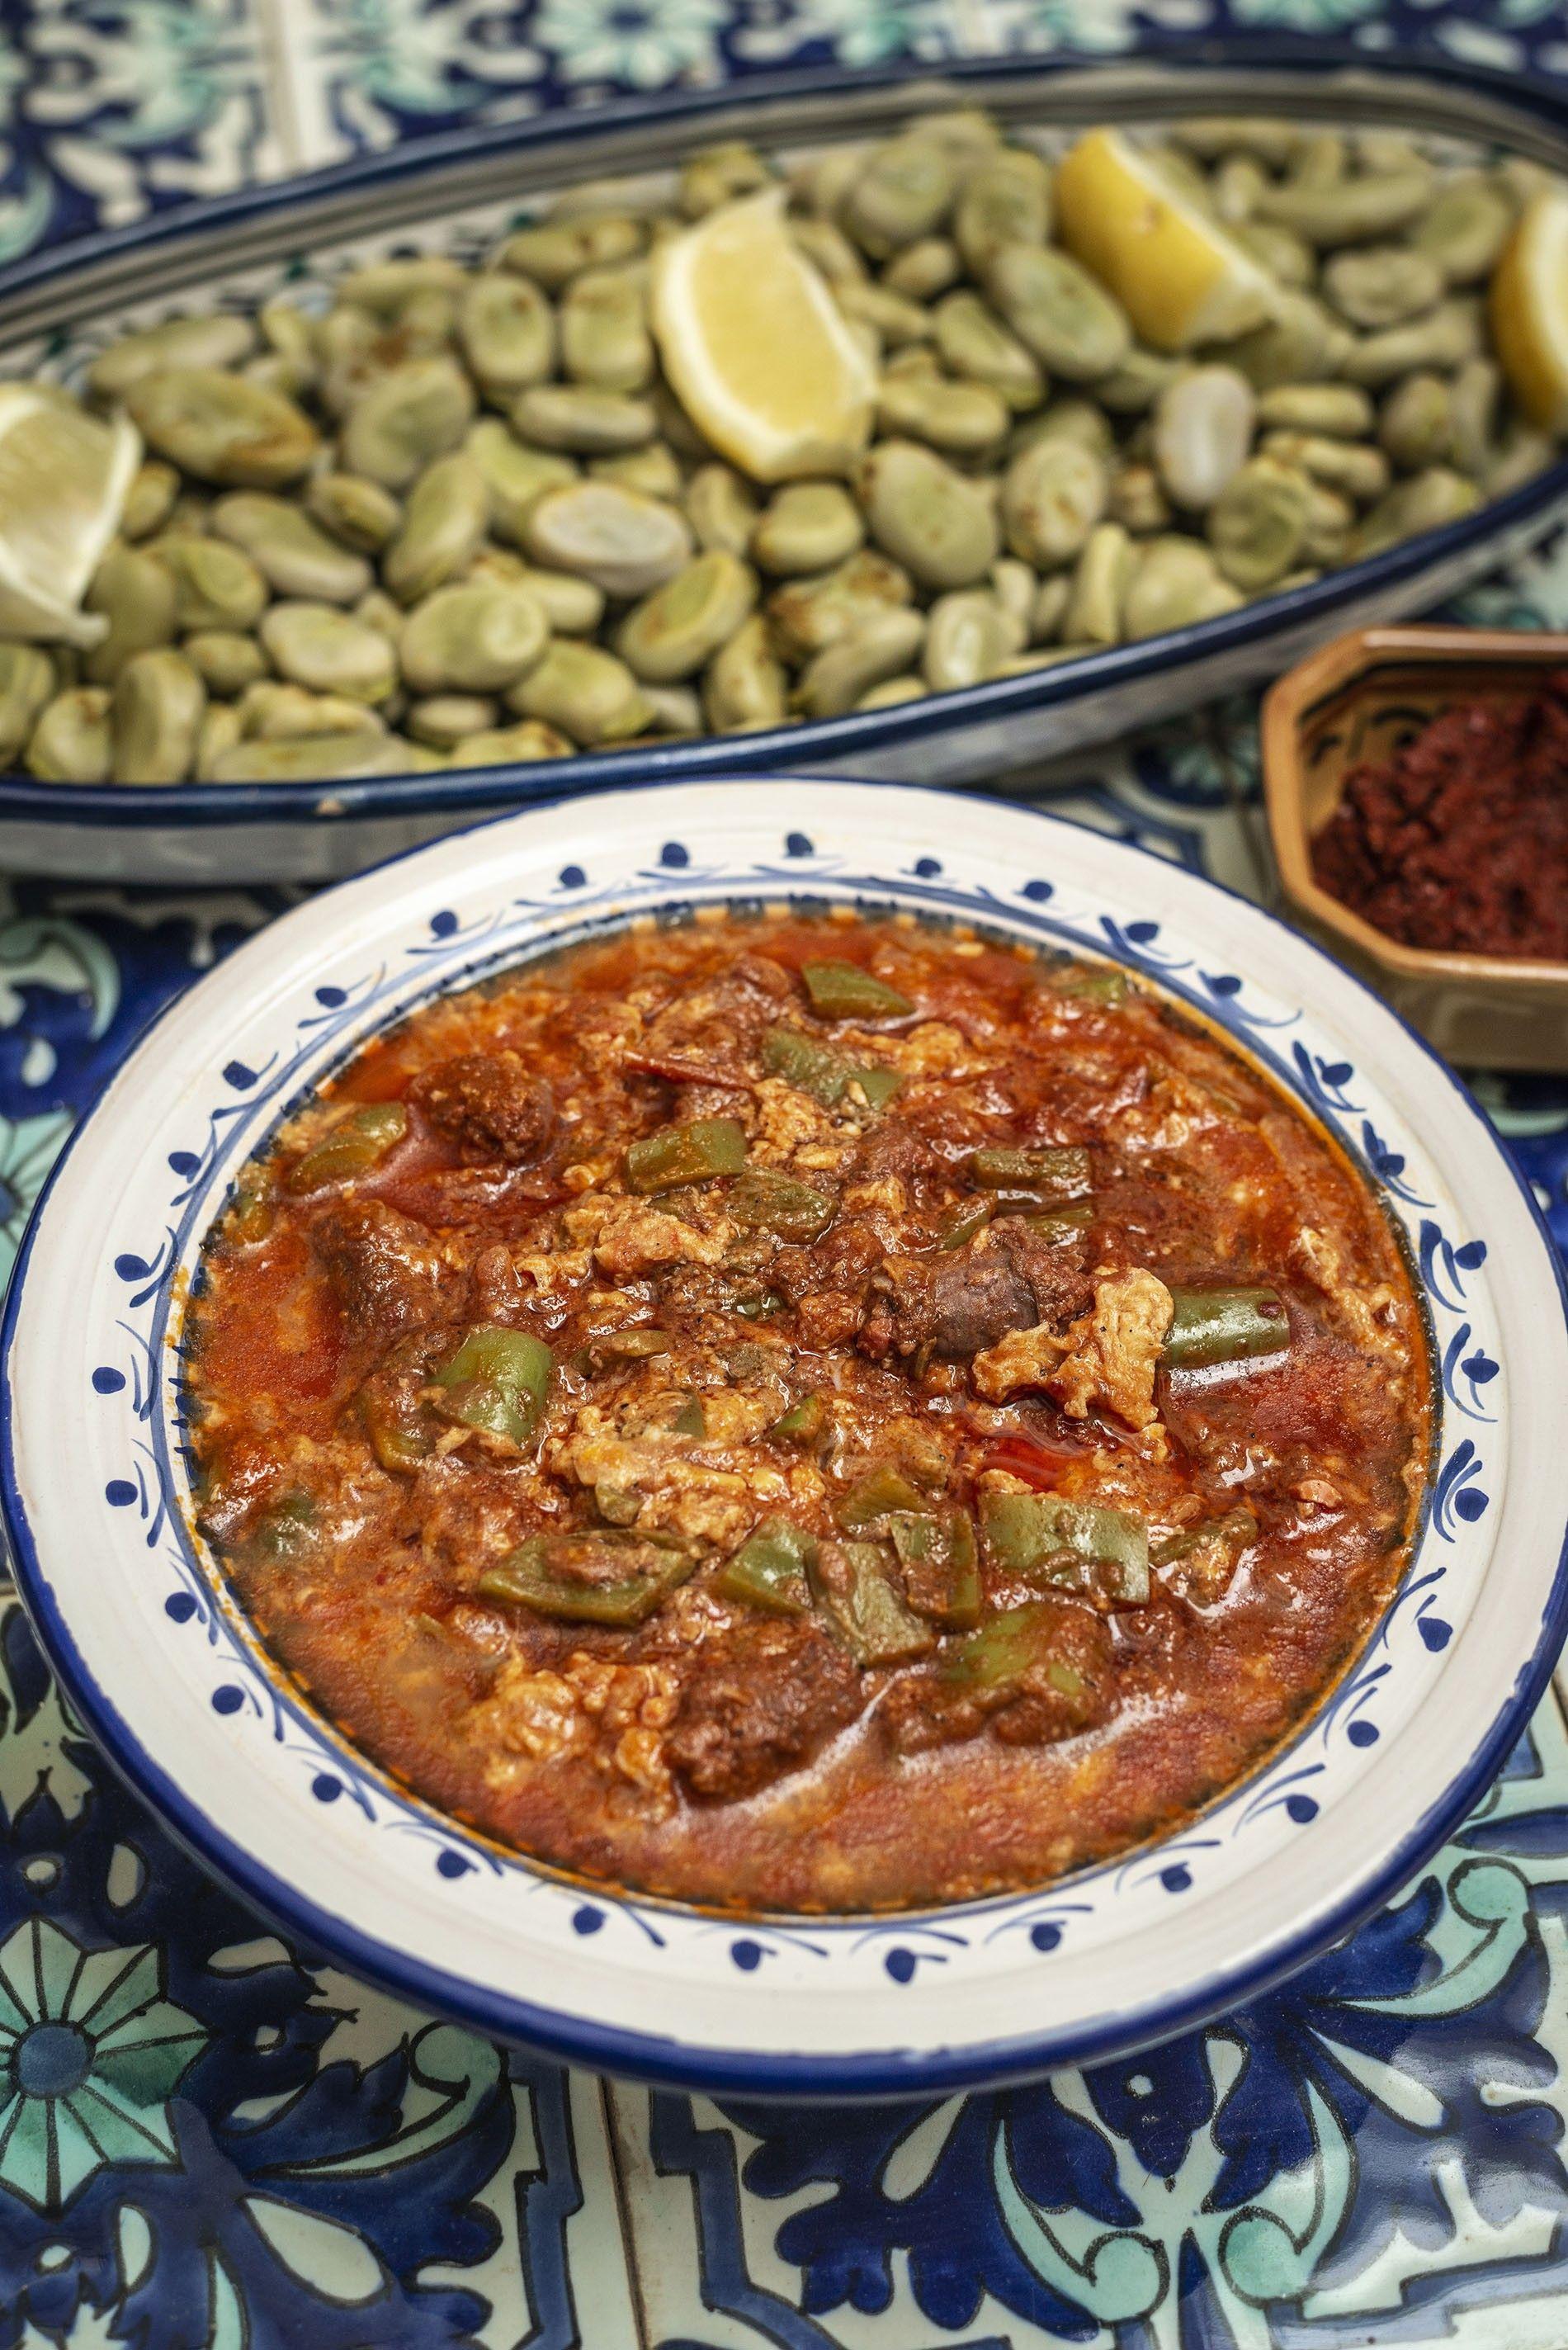 How to make it: Rafik Tatli's ojja with merguez recipe